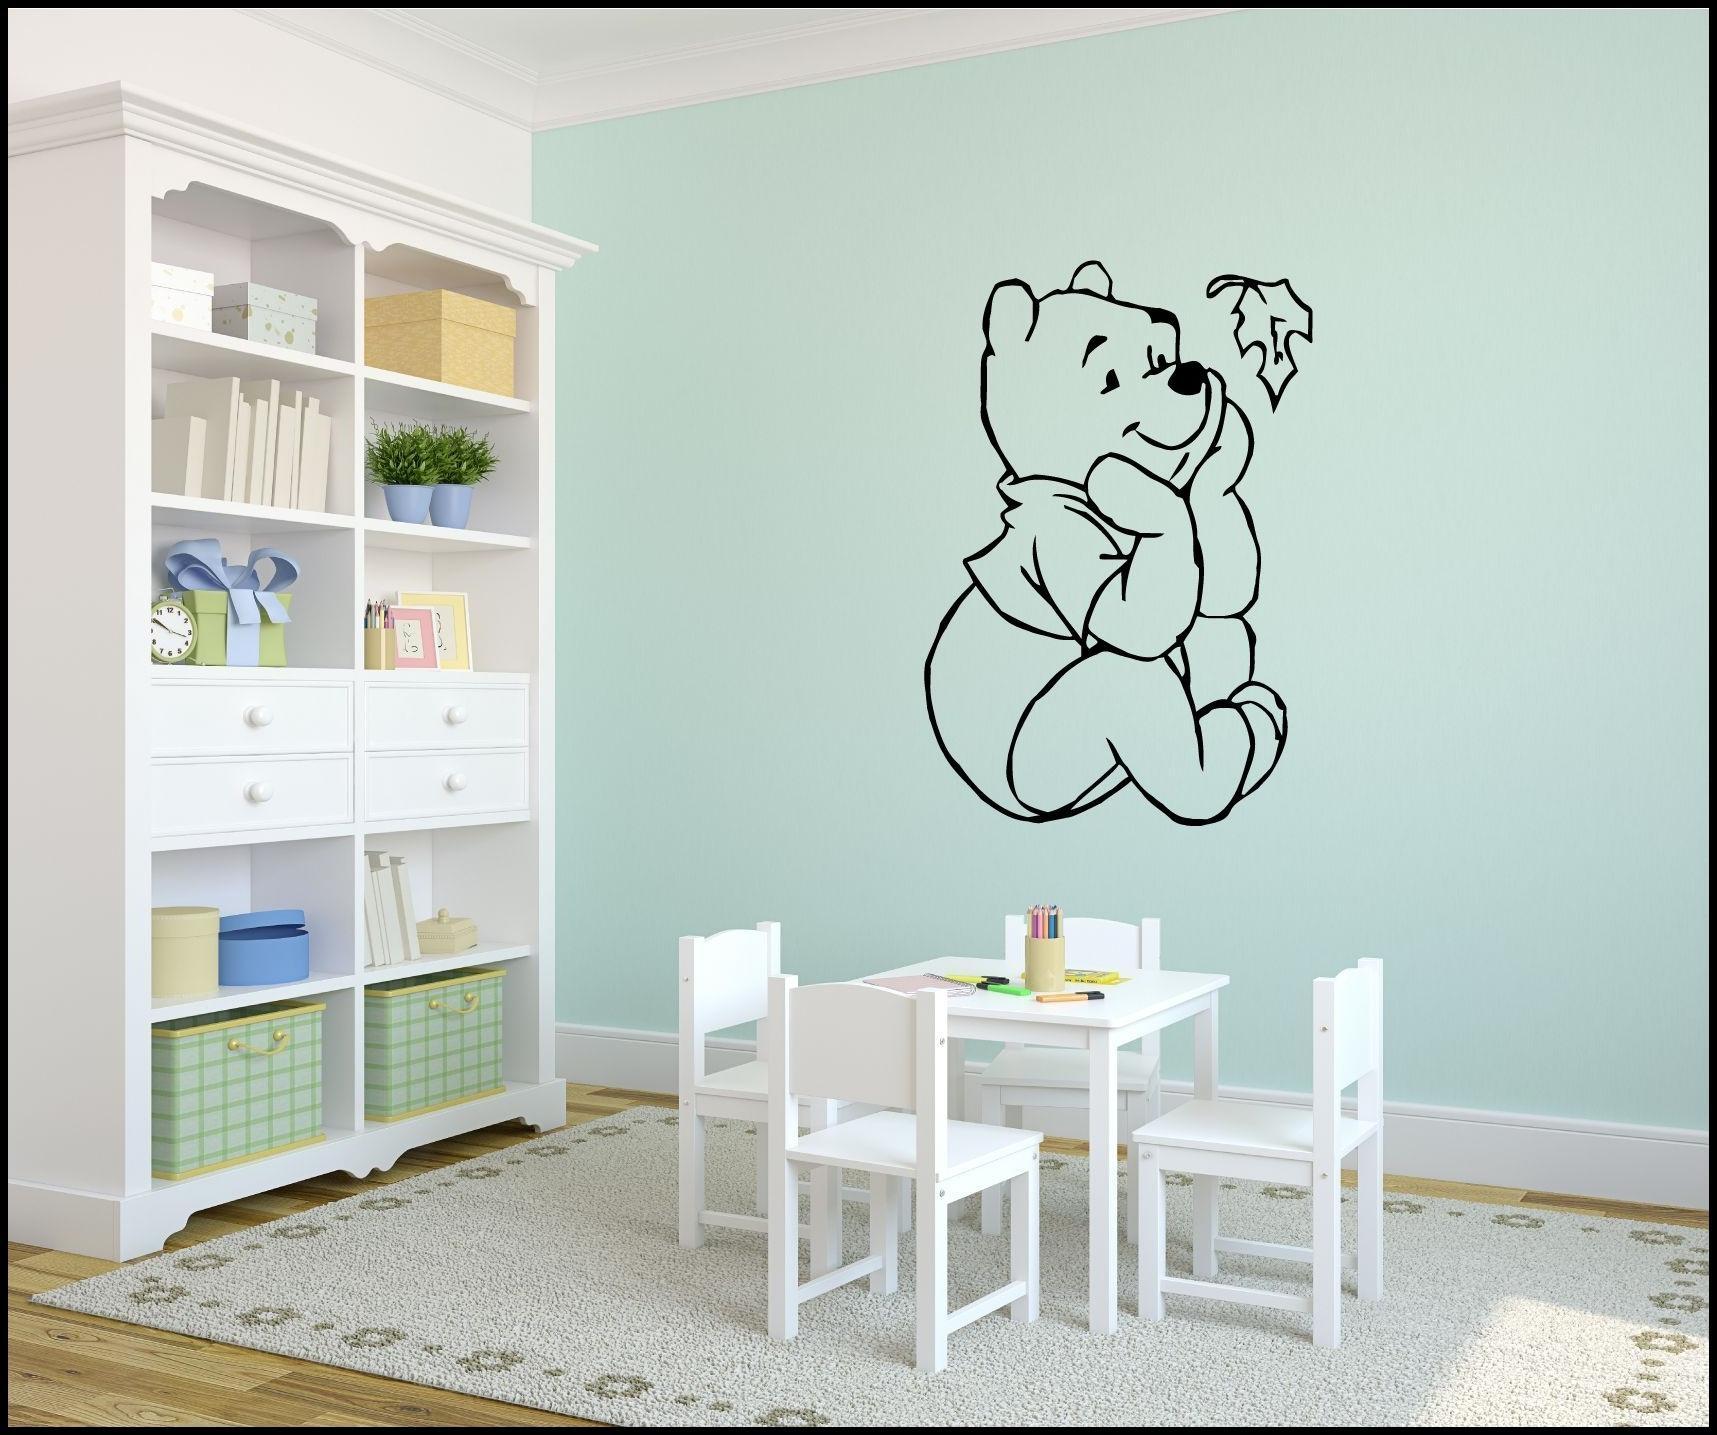 Best Winnie The Pooh Wall Decals Ideas : Winnie The Pooh Wall Regarding Winnie The Pooh Wall Decor (Image 5 of 20)